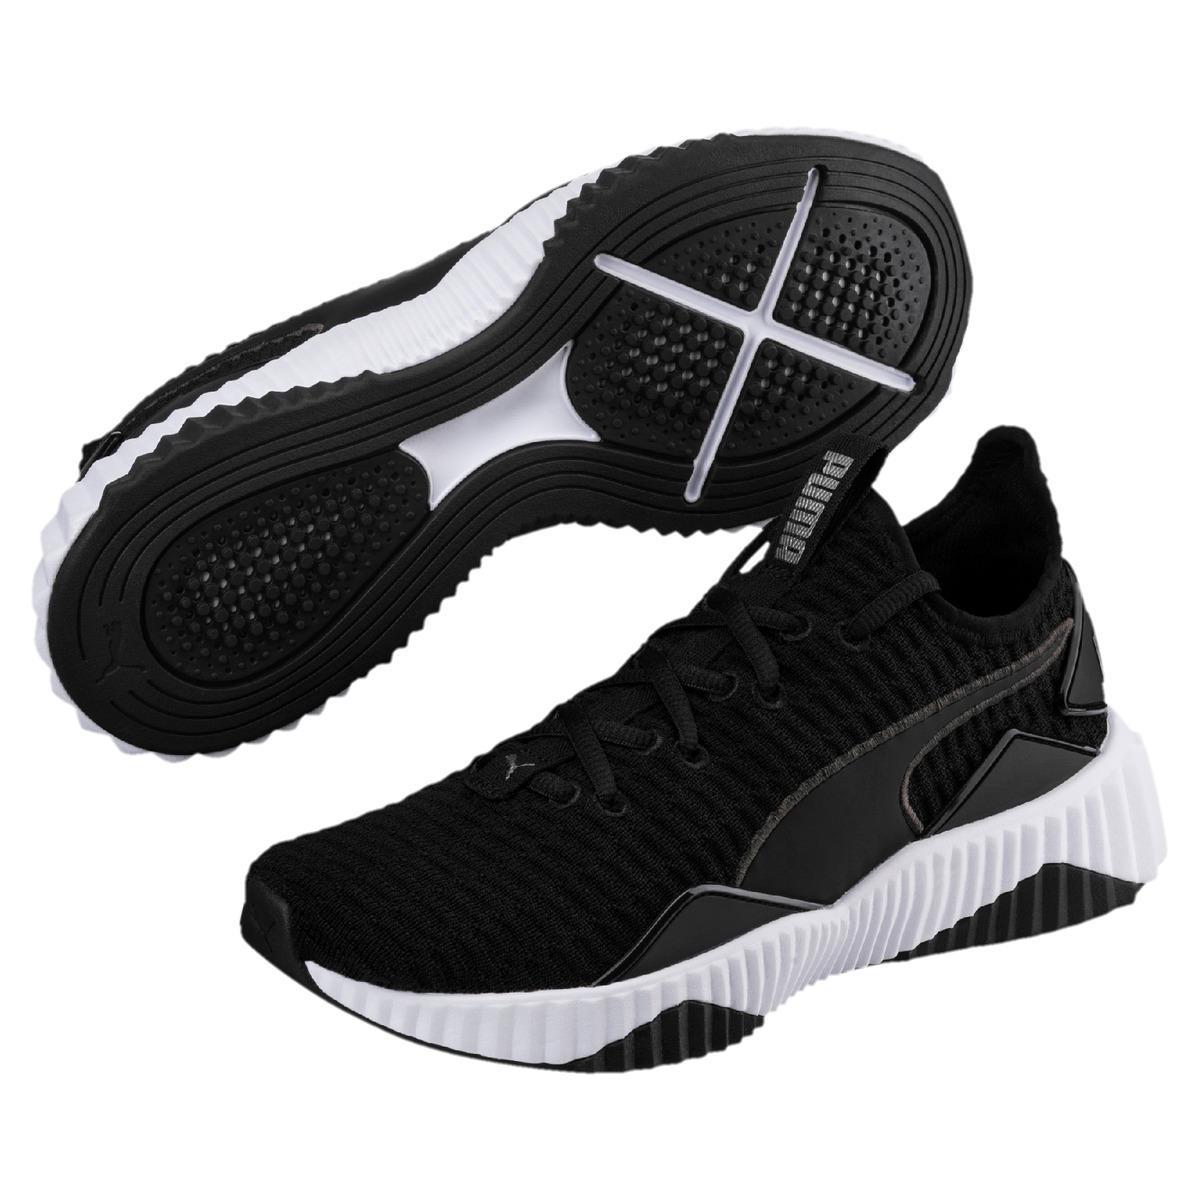 b05e7c7712eea4 Puma Defy Fitness cross Training Shoes in Black - Lyst